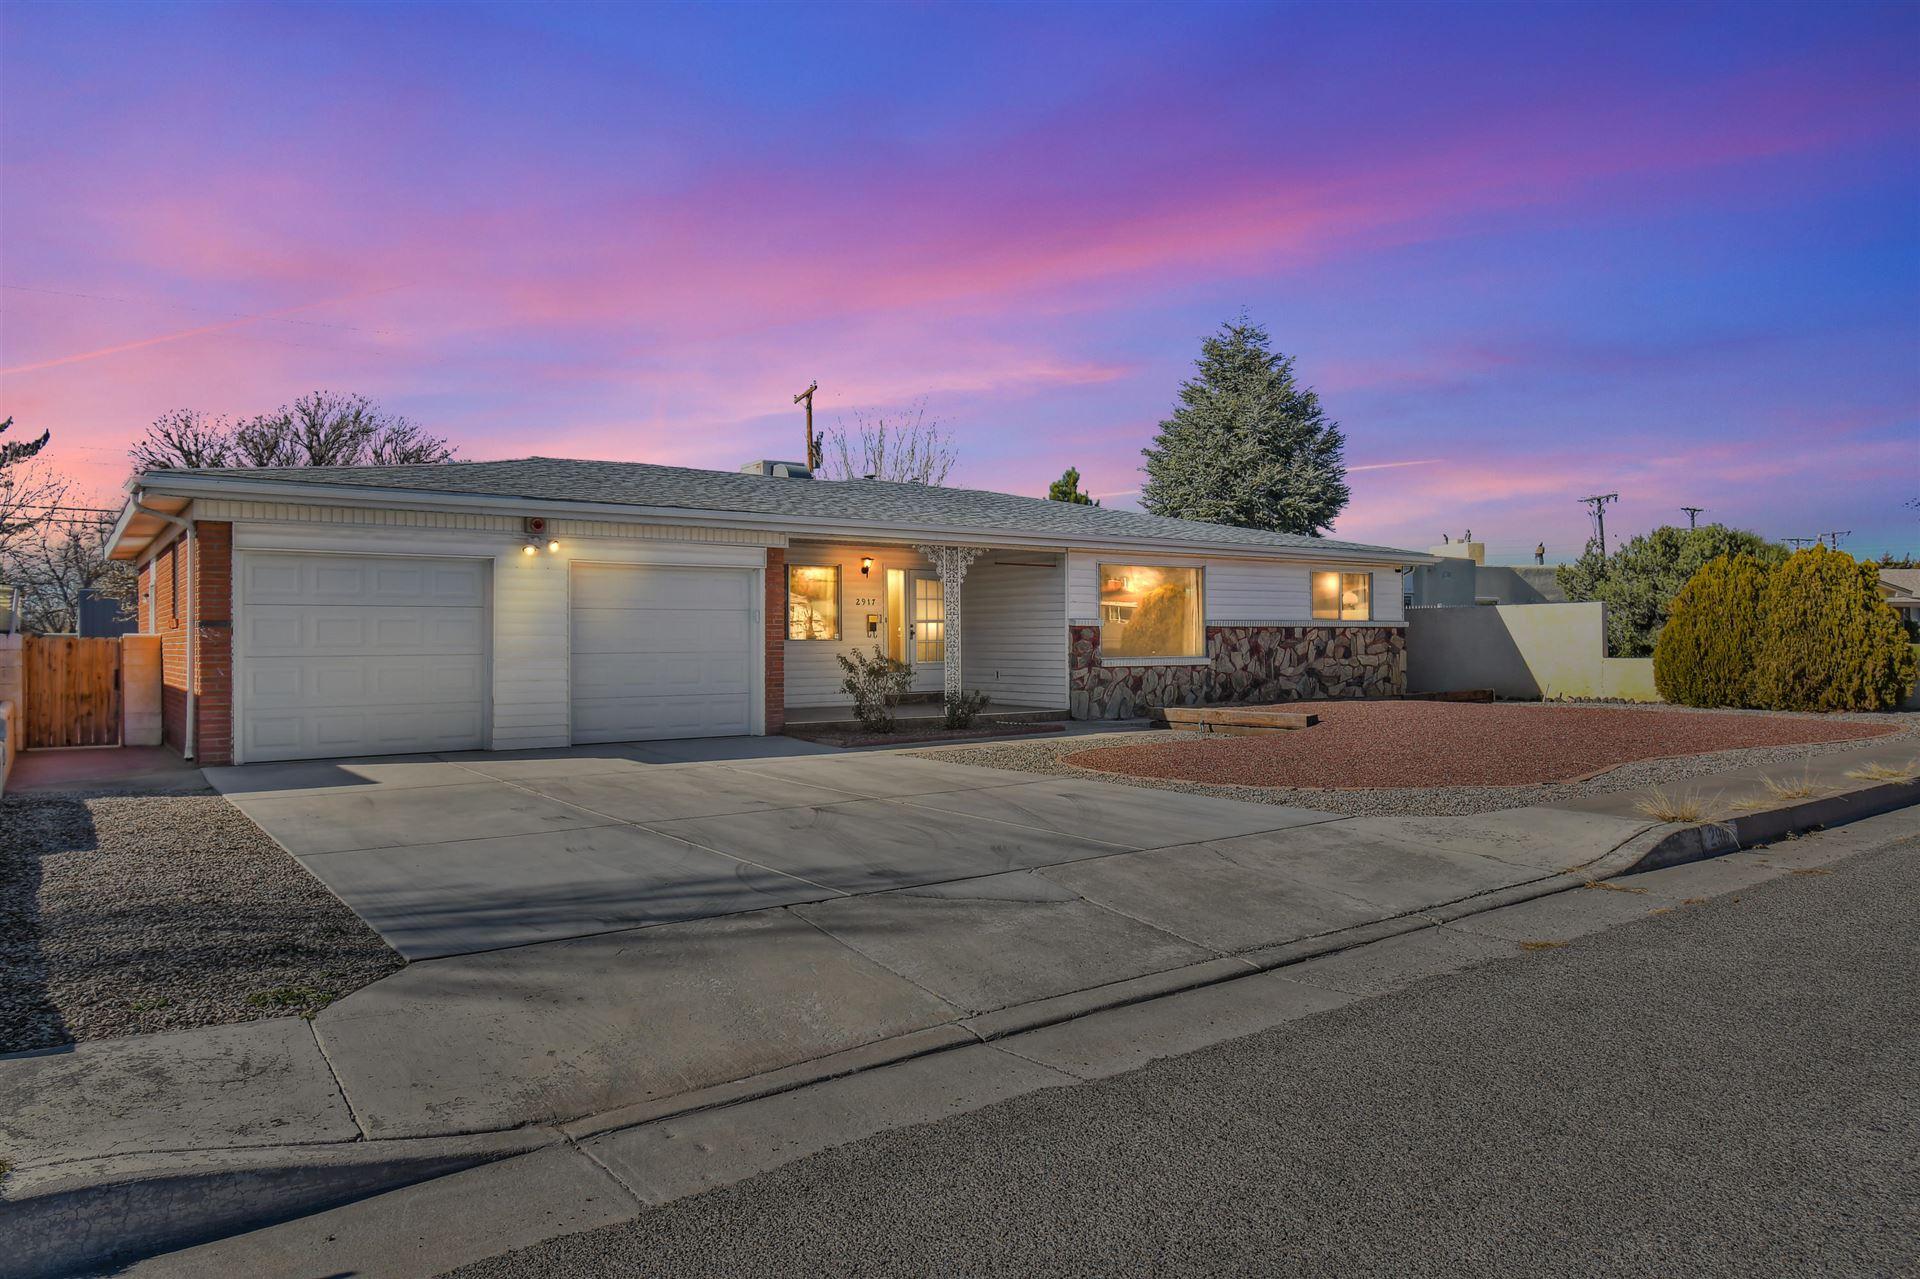 2917 ALCAZAR Street NE, Albuquerque, NM 87110 - MLS#: 982148